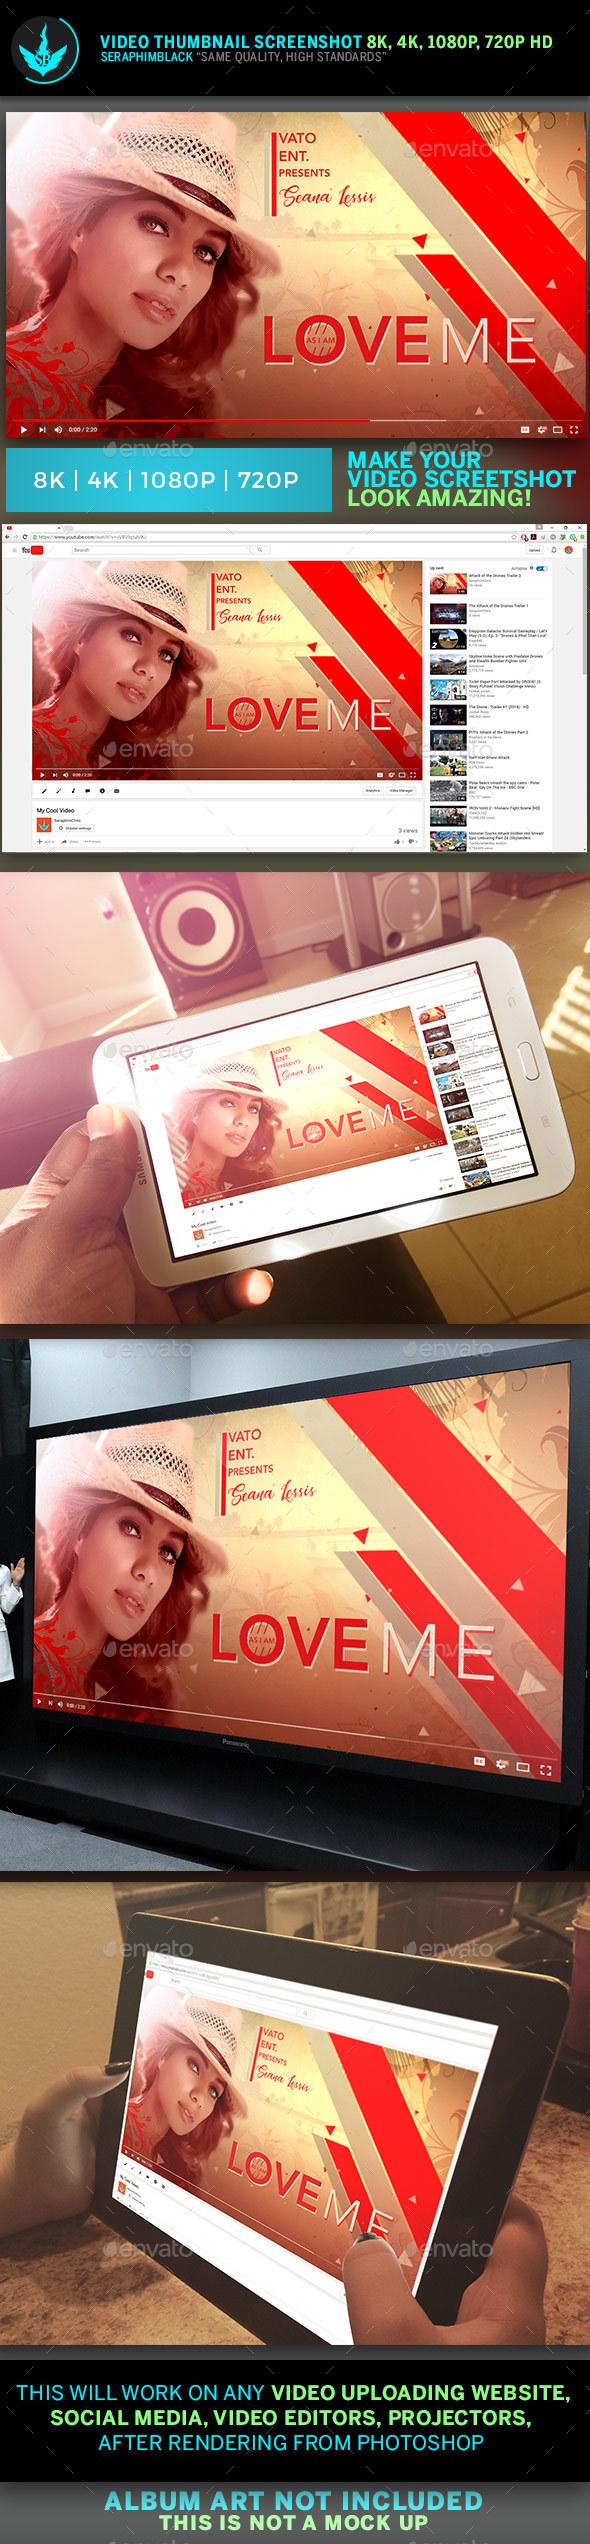 Love Me YouTube Video Artwork Thumbnail Template - YouTube Social Media